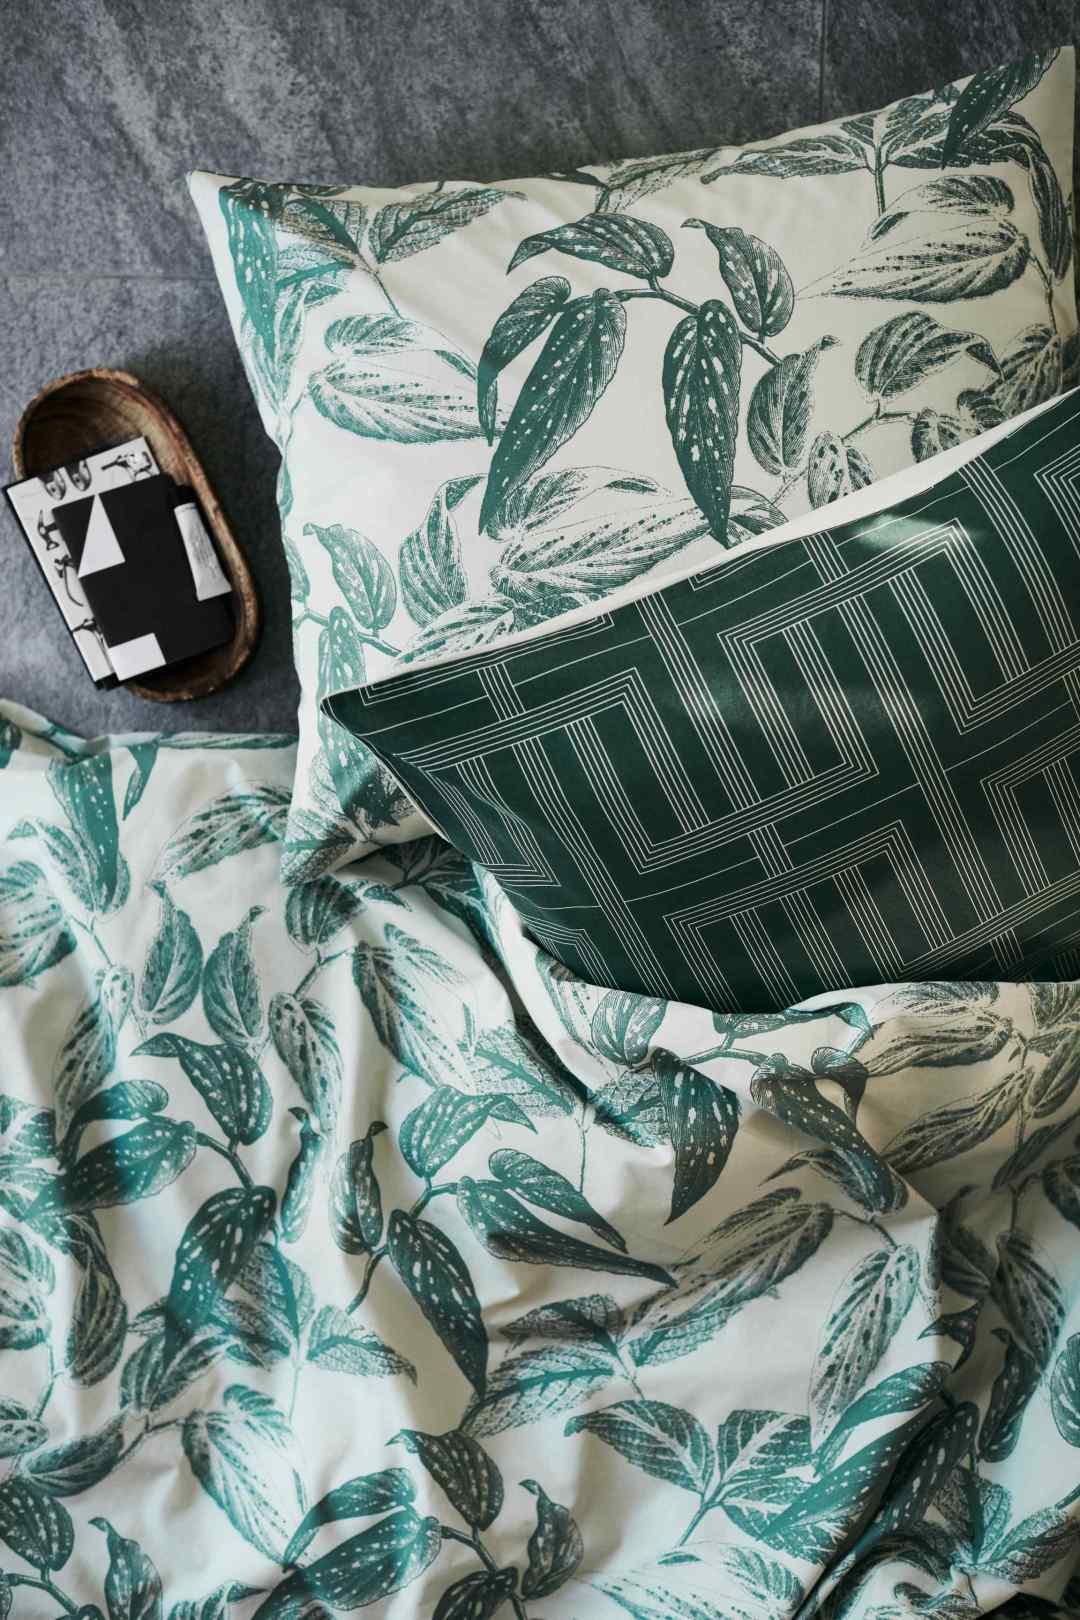 Leaf print duvet cover set by H&M Home - Tropical bedroom- Transform your home into a tropical paradise | Aliz's Wonderland